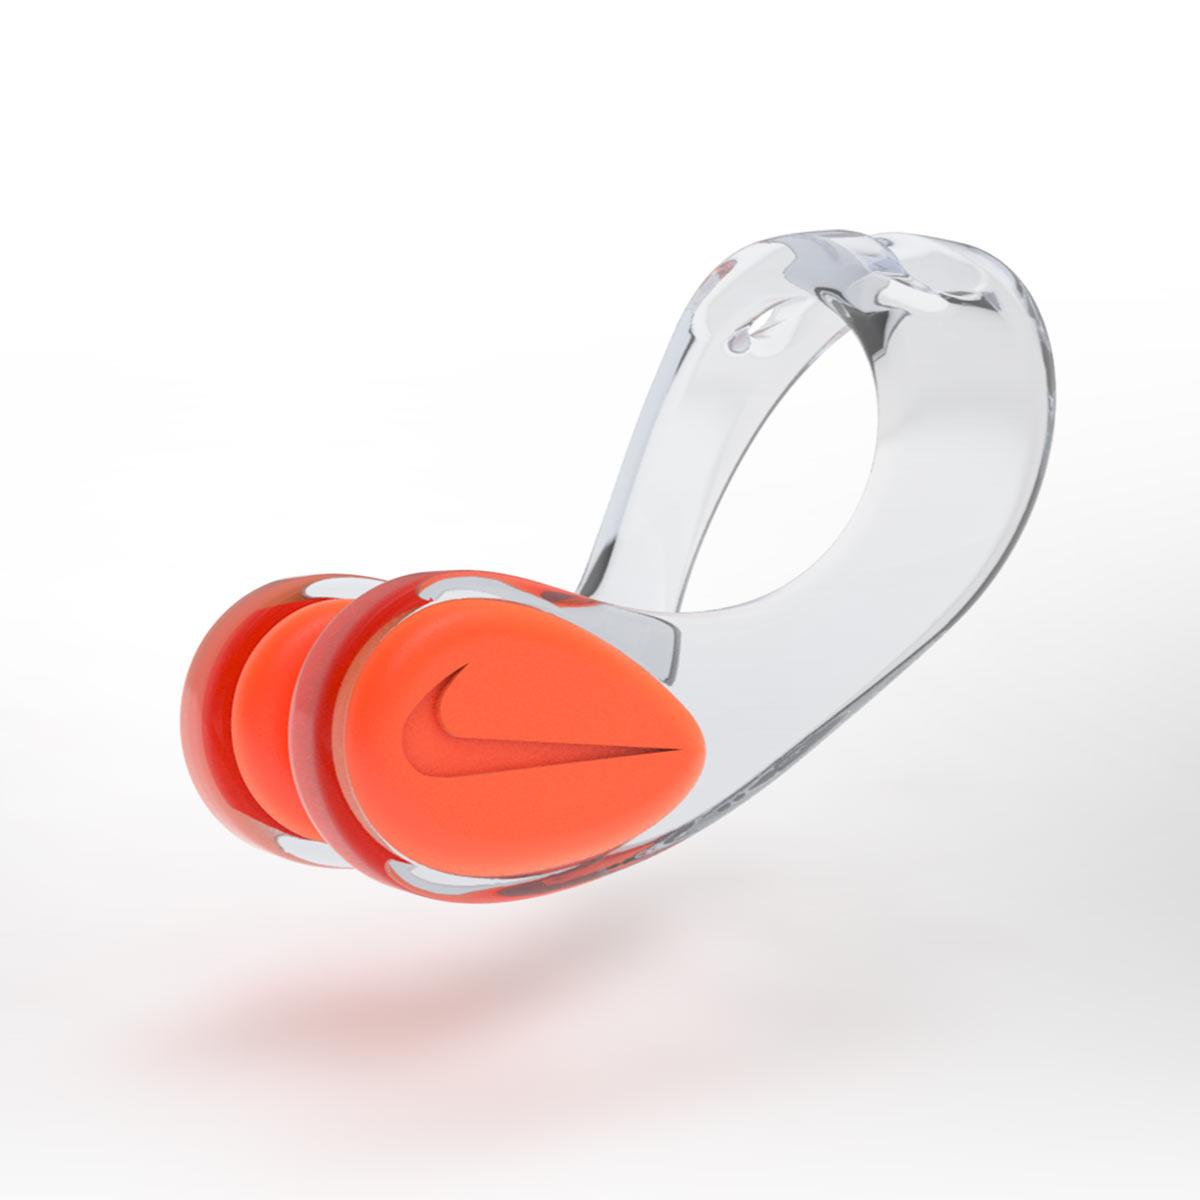 nike swim nose plug product